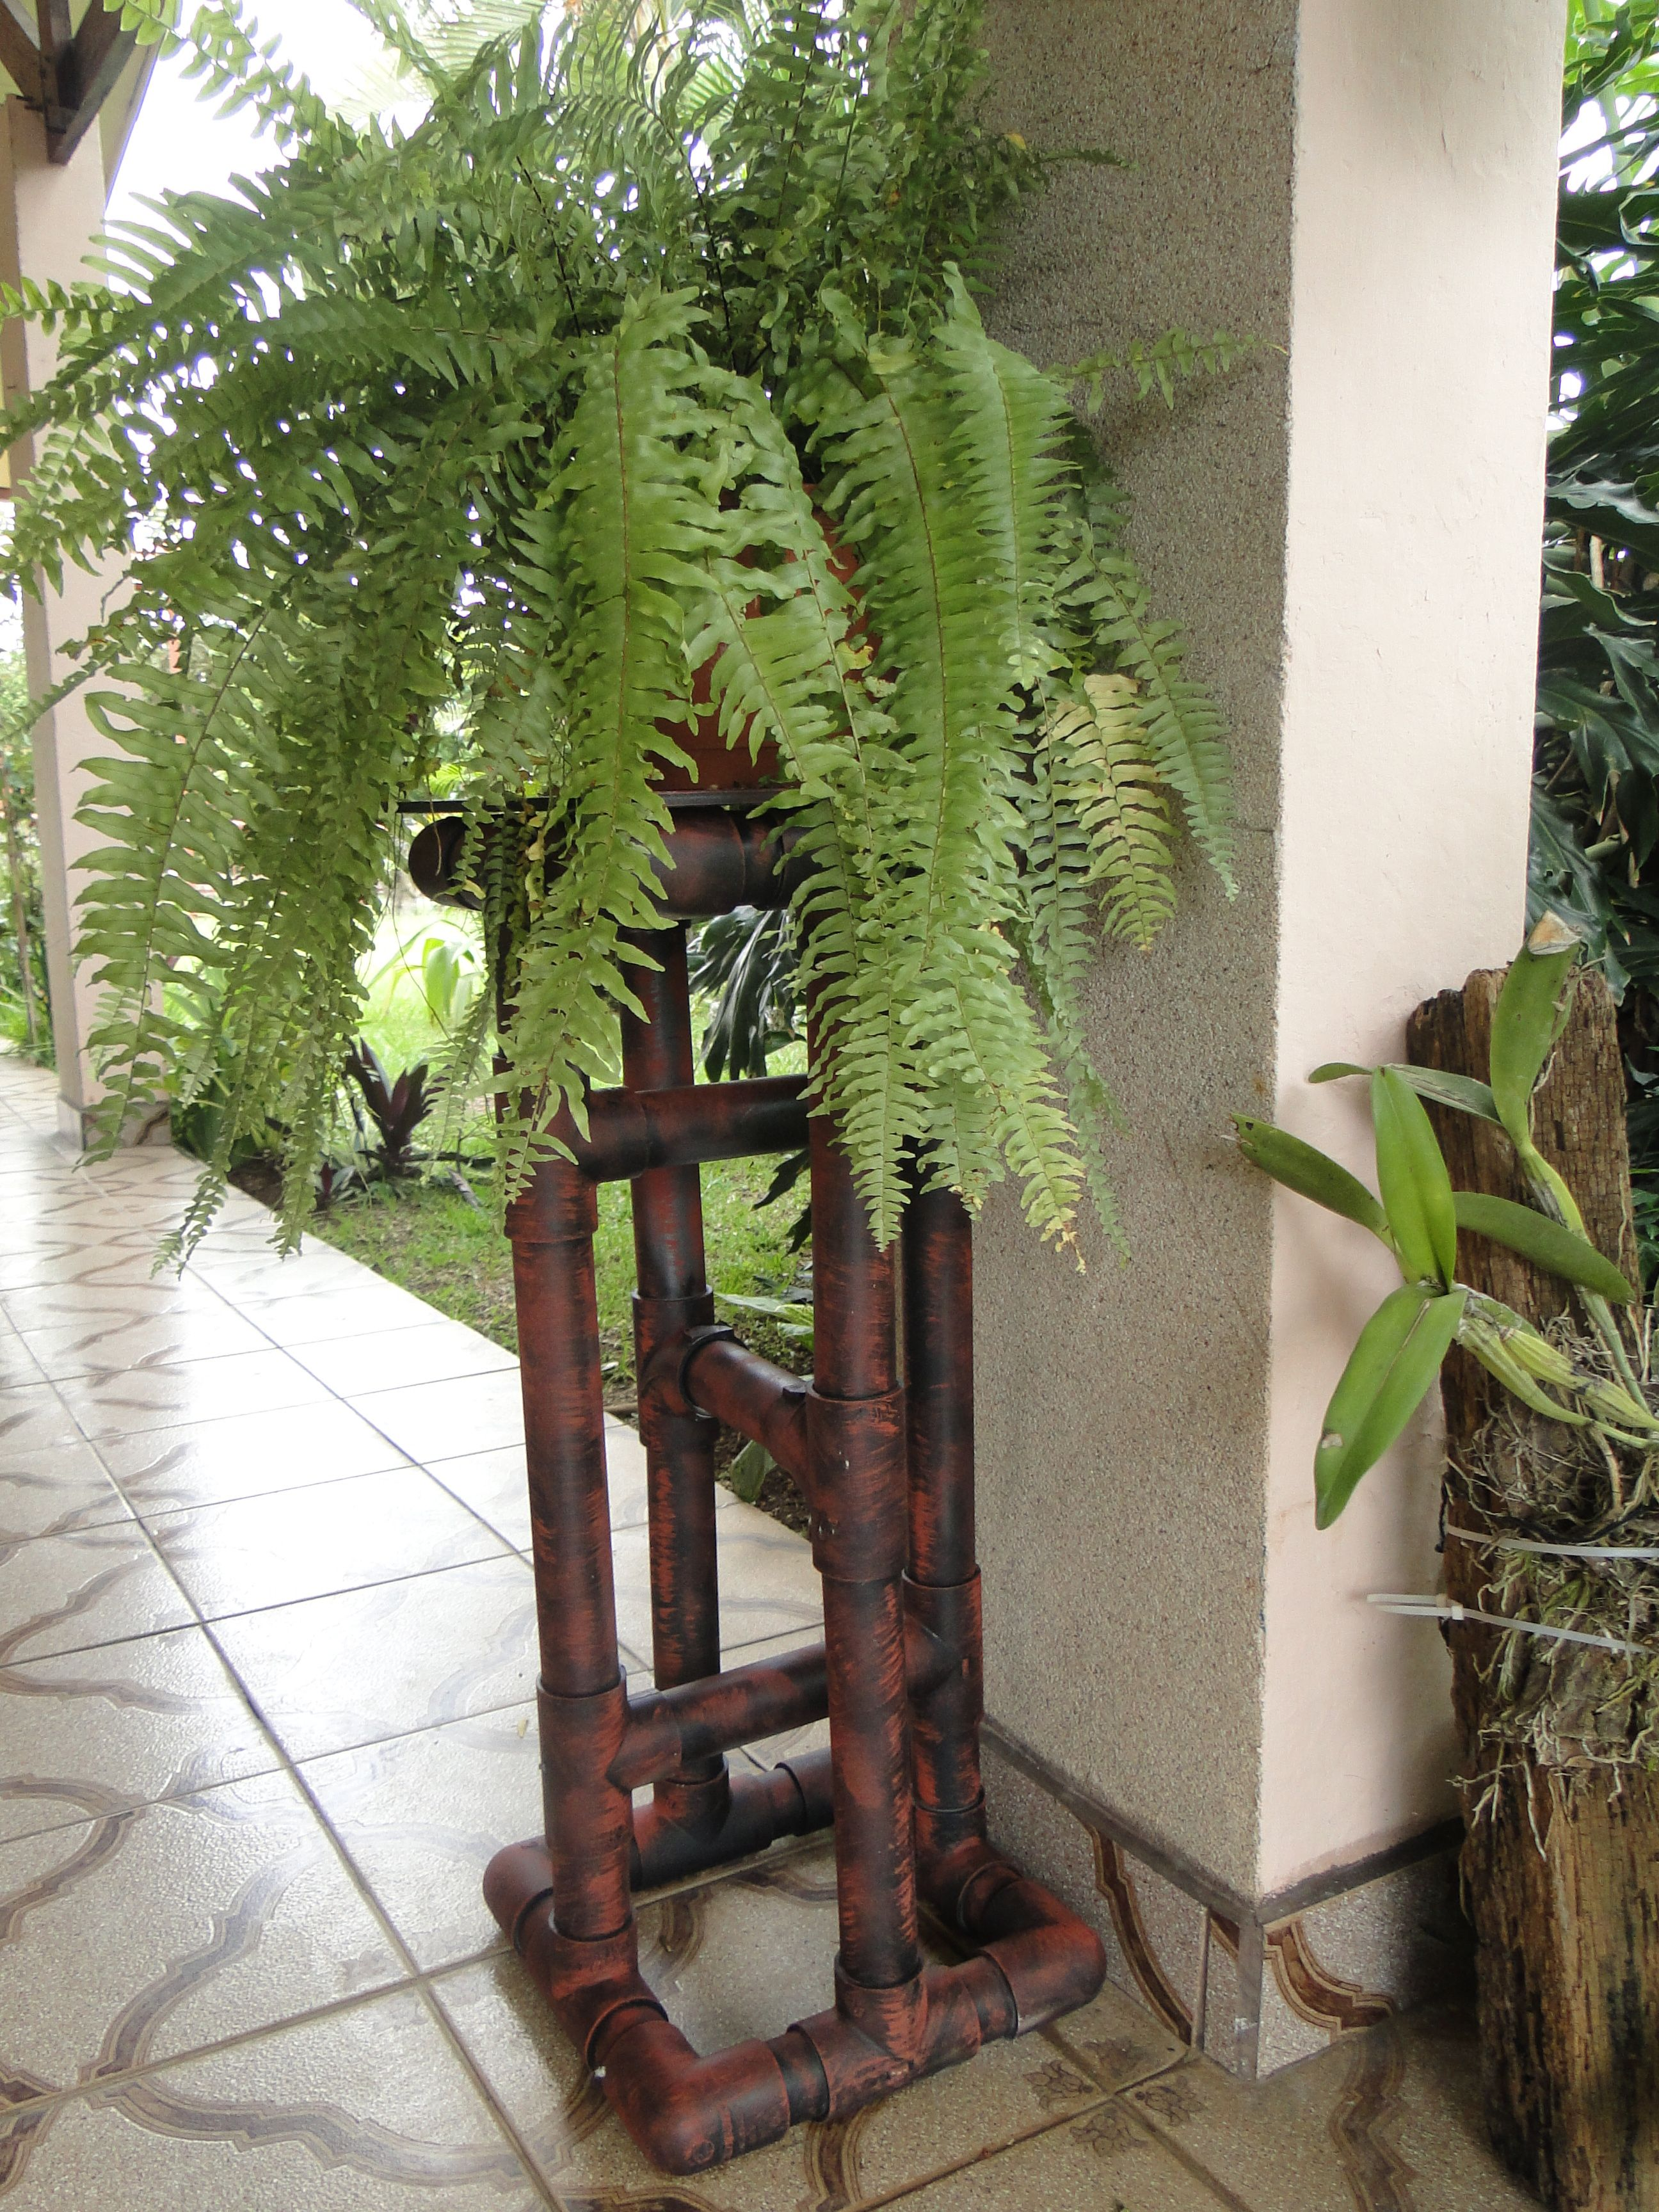 Pedestal de tubo de pvc para elechos macetas - Pedestal para plantas ...